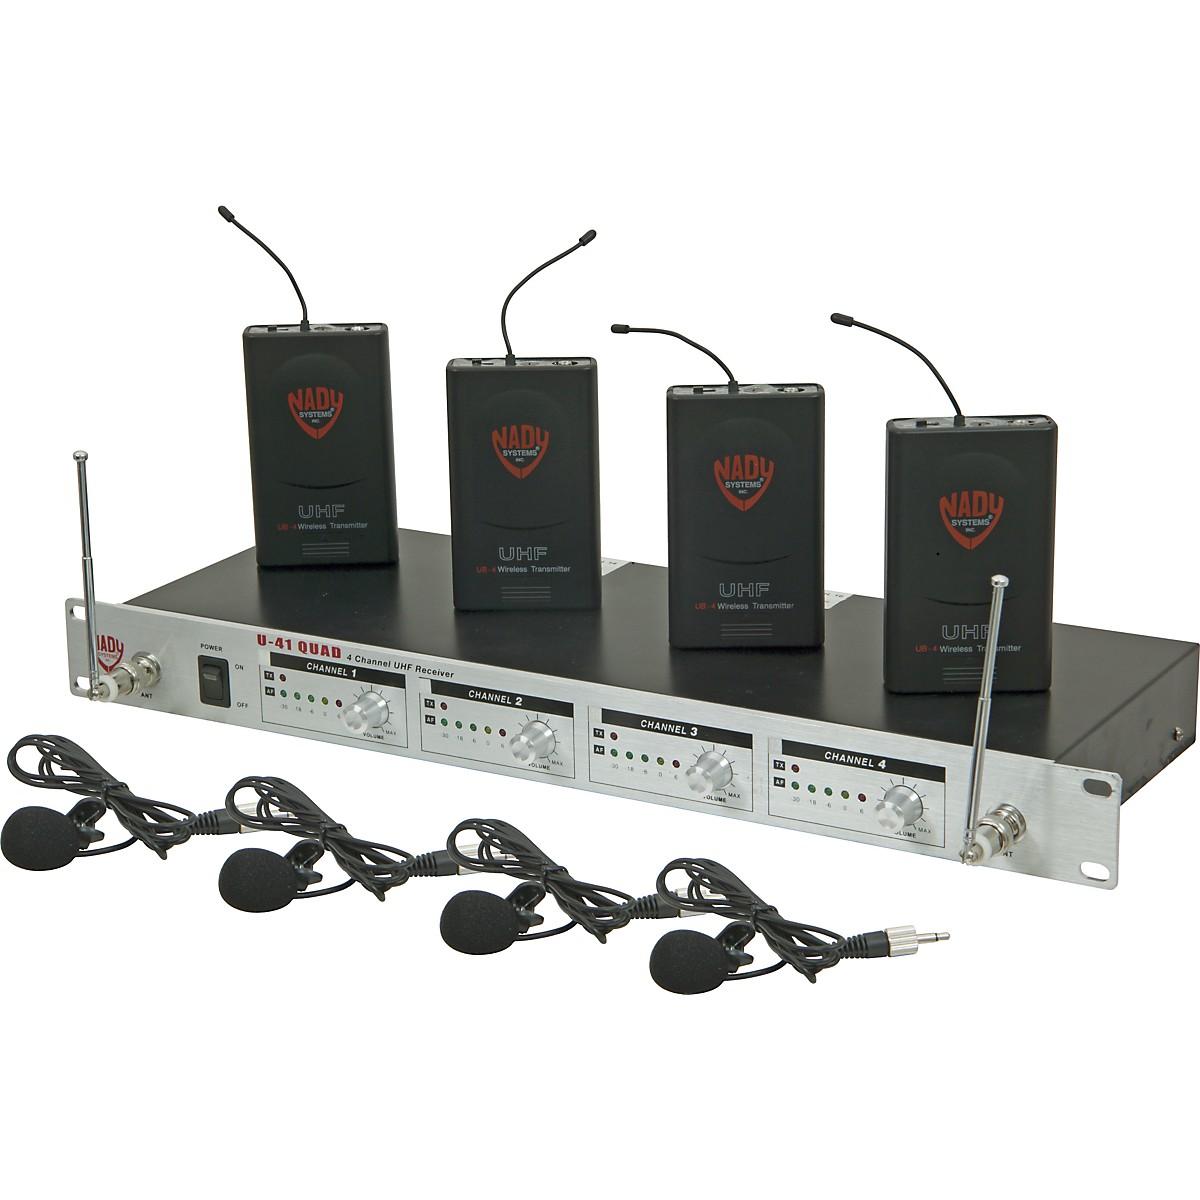 Nady U-41 Quad Omni Lav Wireless System (14/16/10/12)